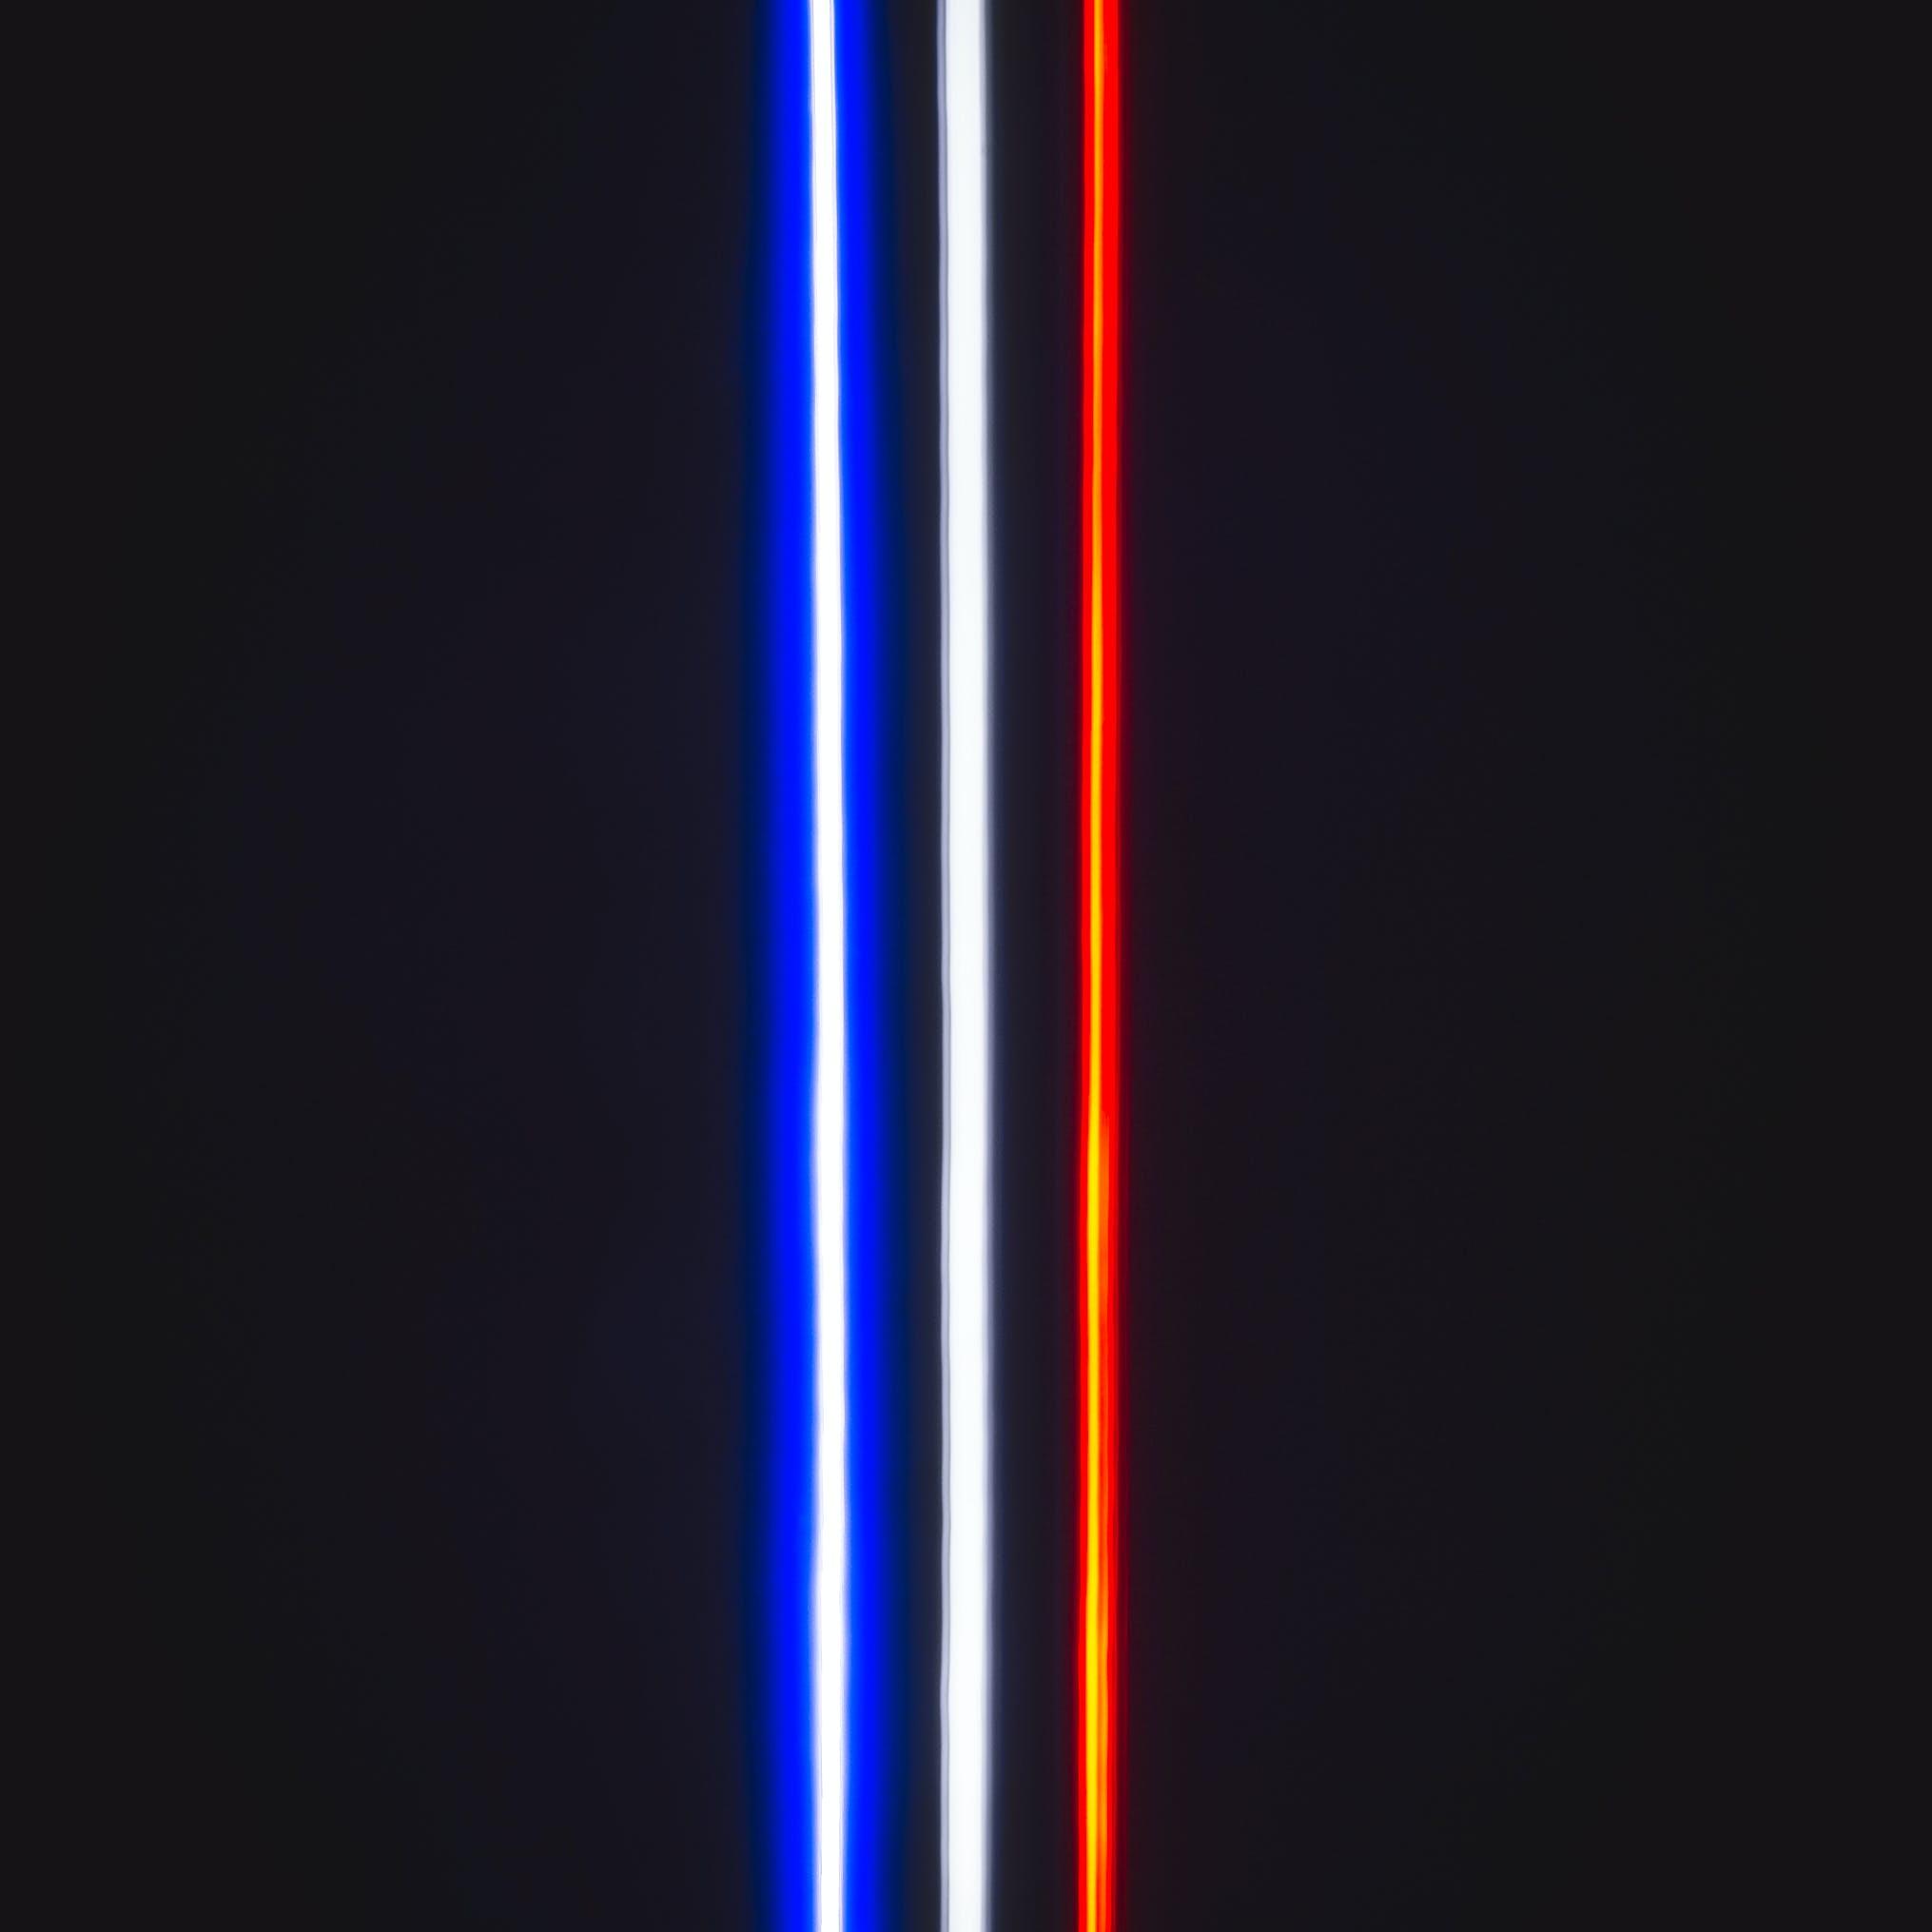 Free stock photo of france, dark, motion, flag